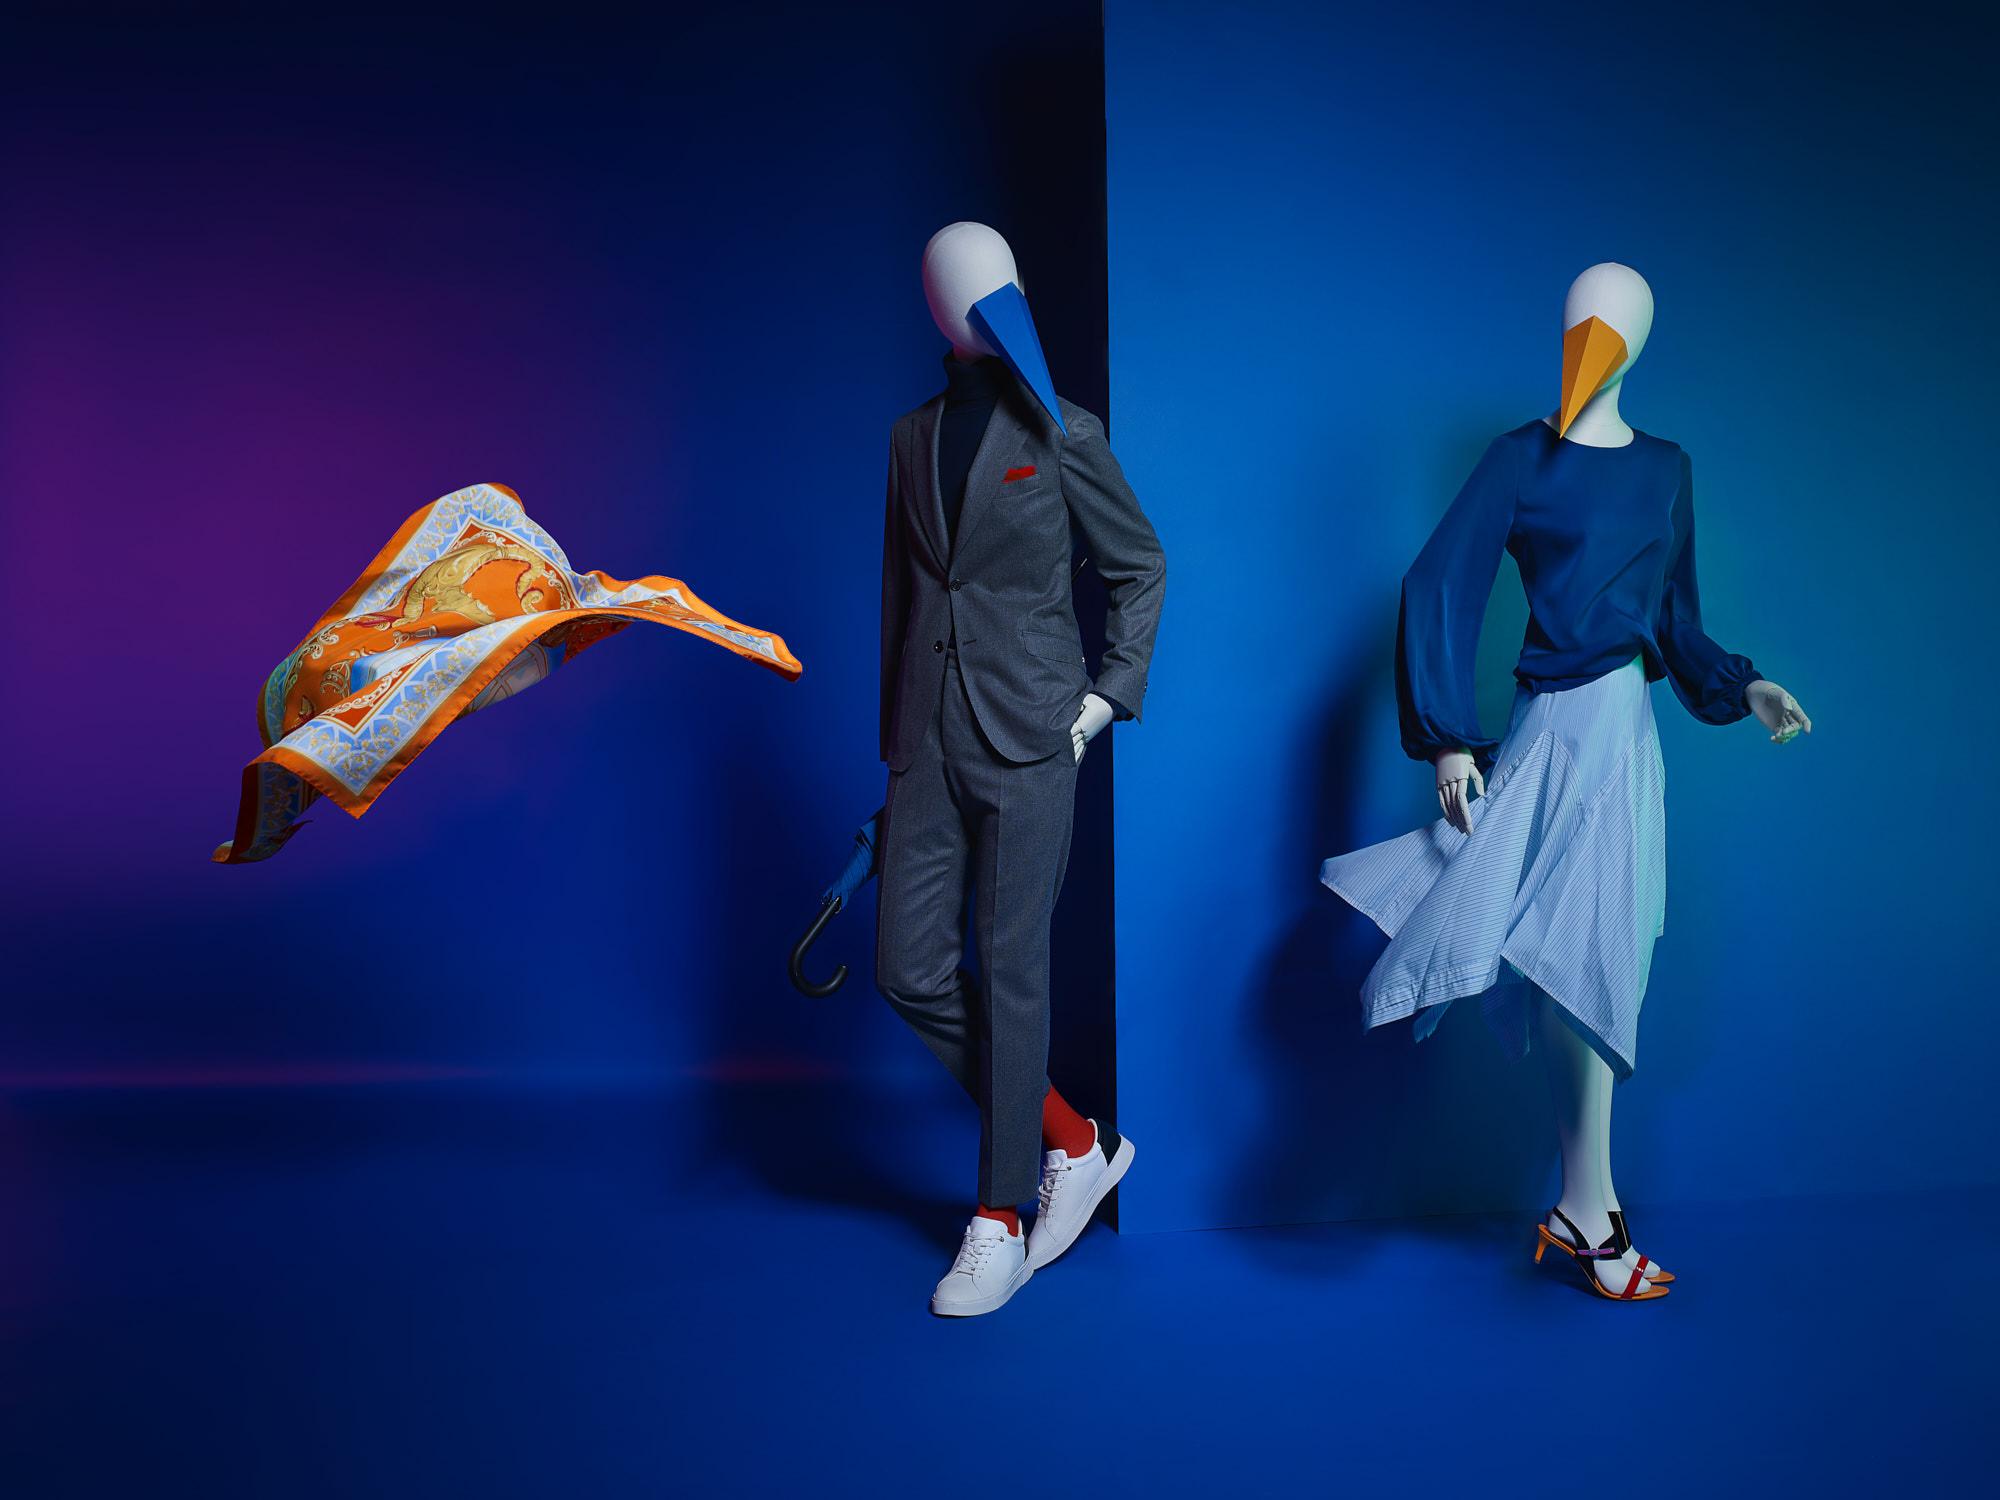 bernd-westphal-stillstars-vanlaack-mannequin-fashion-still-life-photography-003